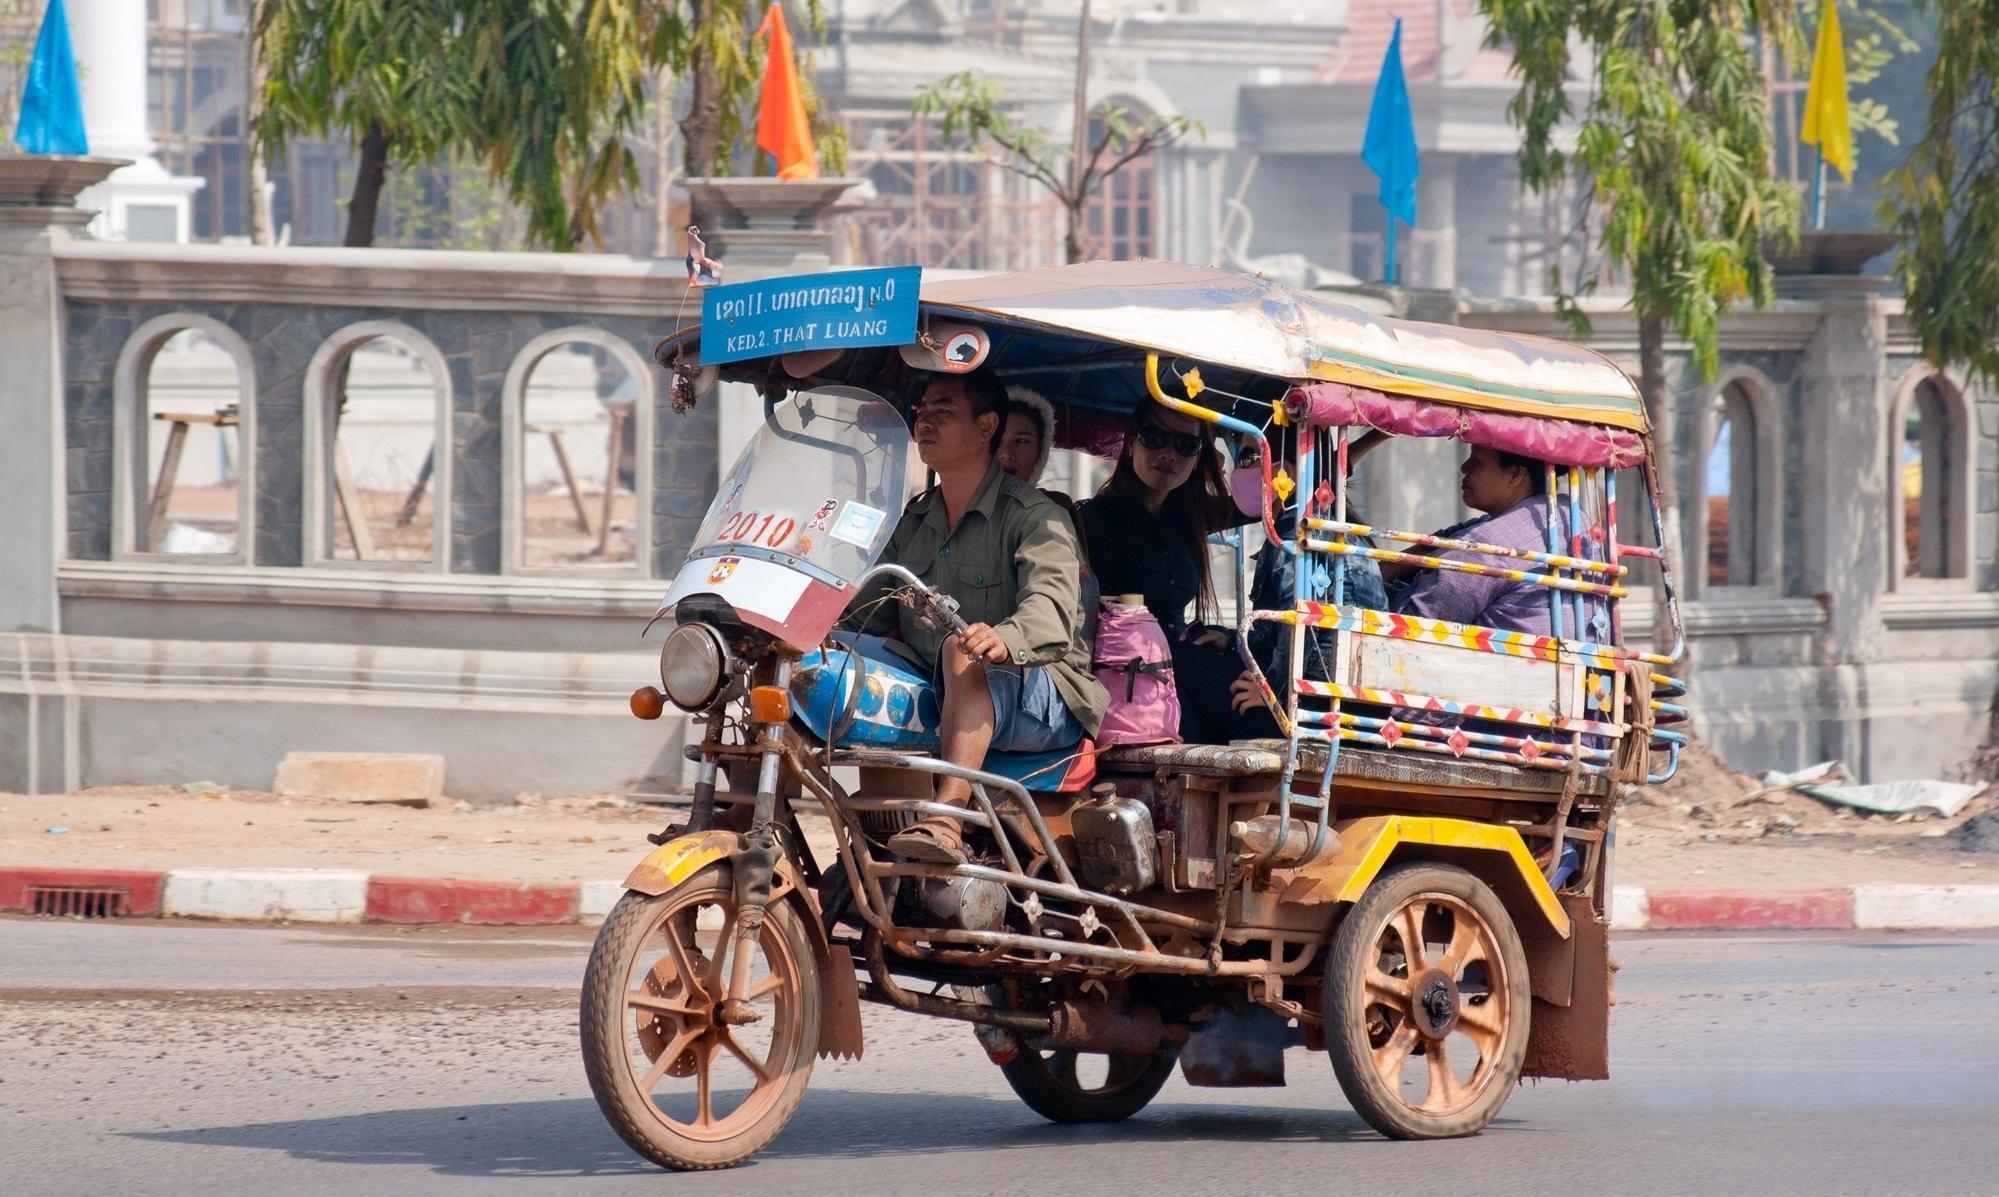 Tuk-tuk in Vientiane